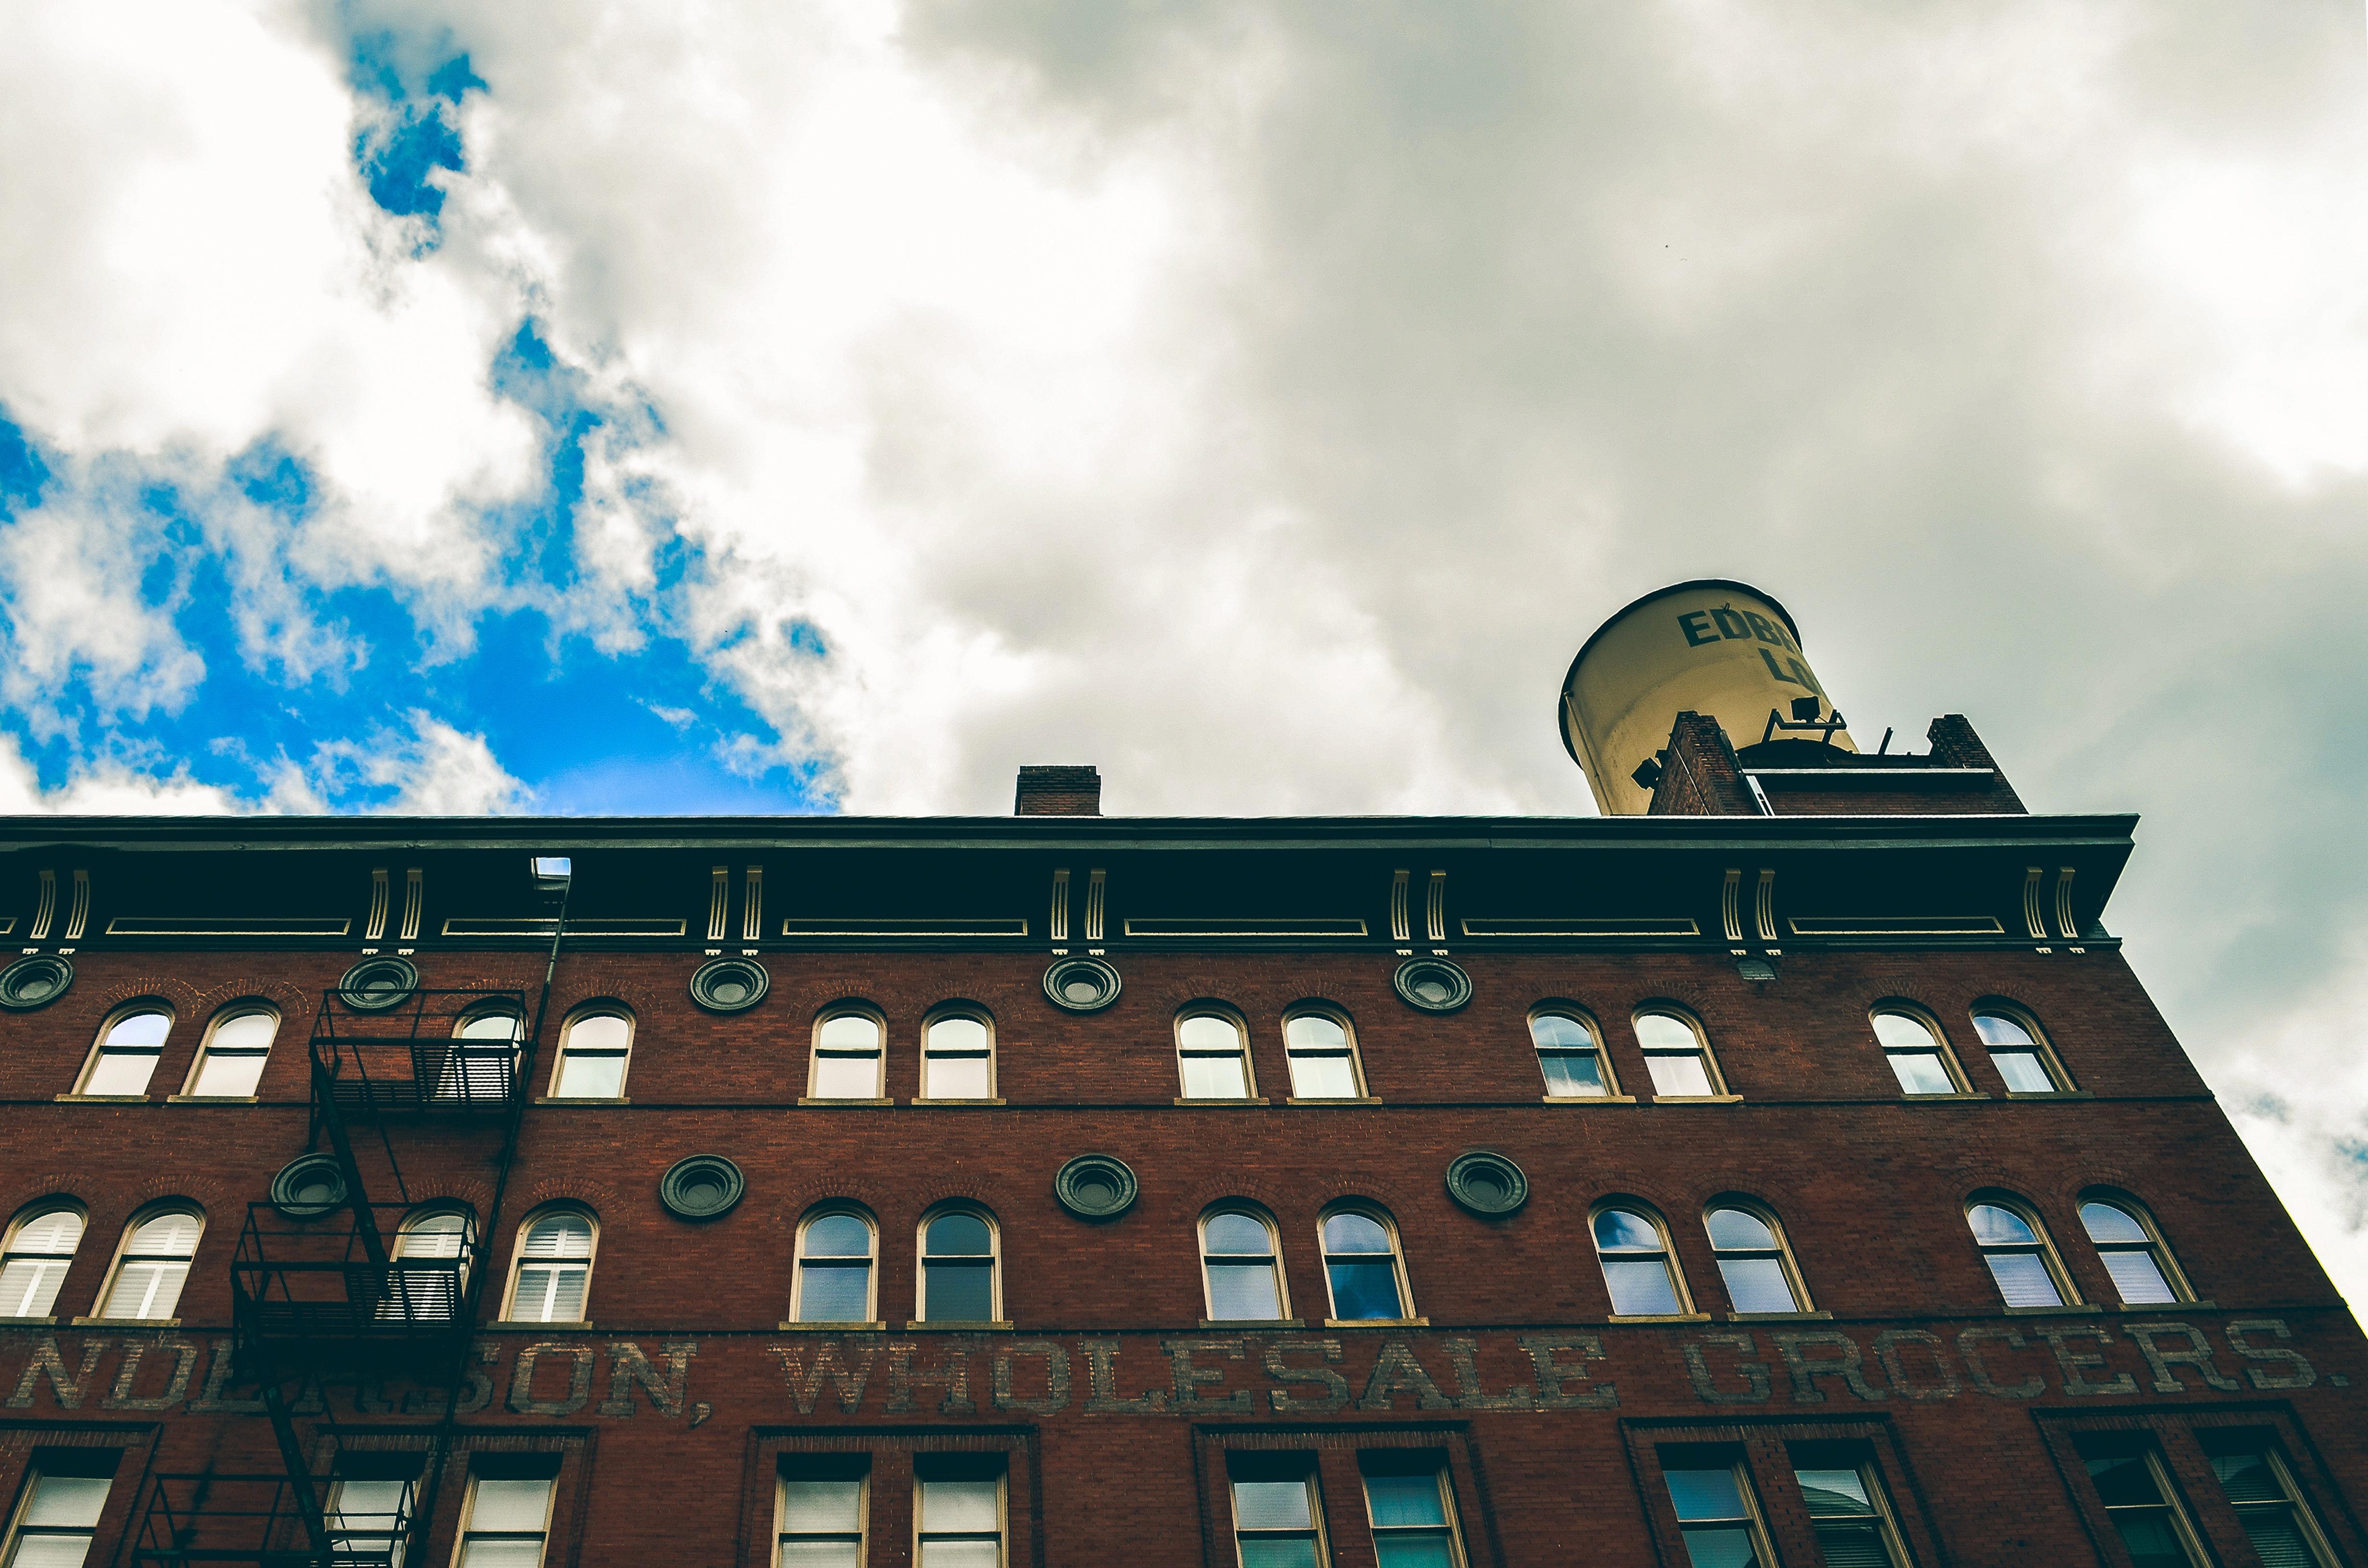 Brown Concrete Biulding, Glass windows, Windows, Urban, Sky, HQ Photo